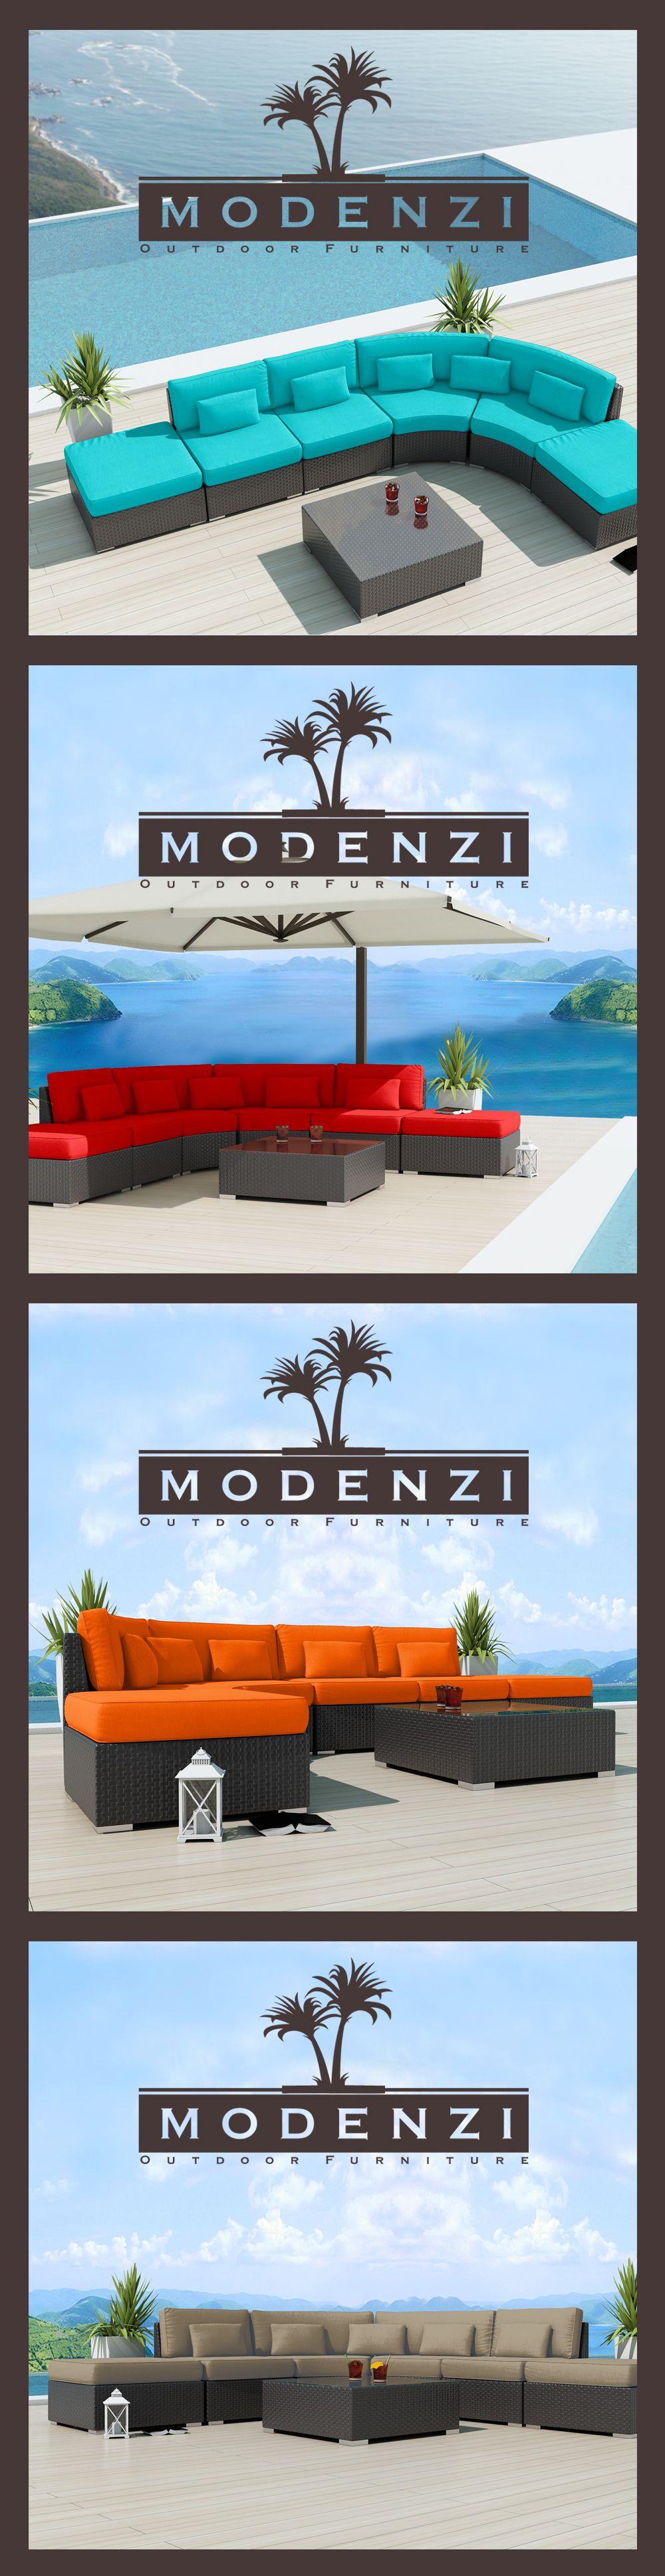 Modenzi 7x Modern Patio Rattan Wicker Set Outdoor Sectional Sofa